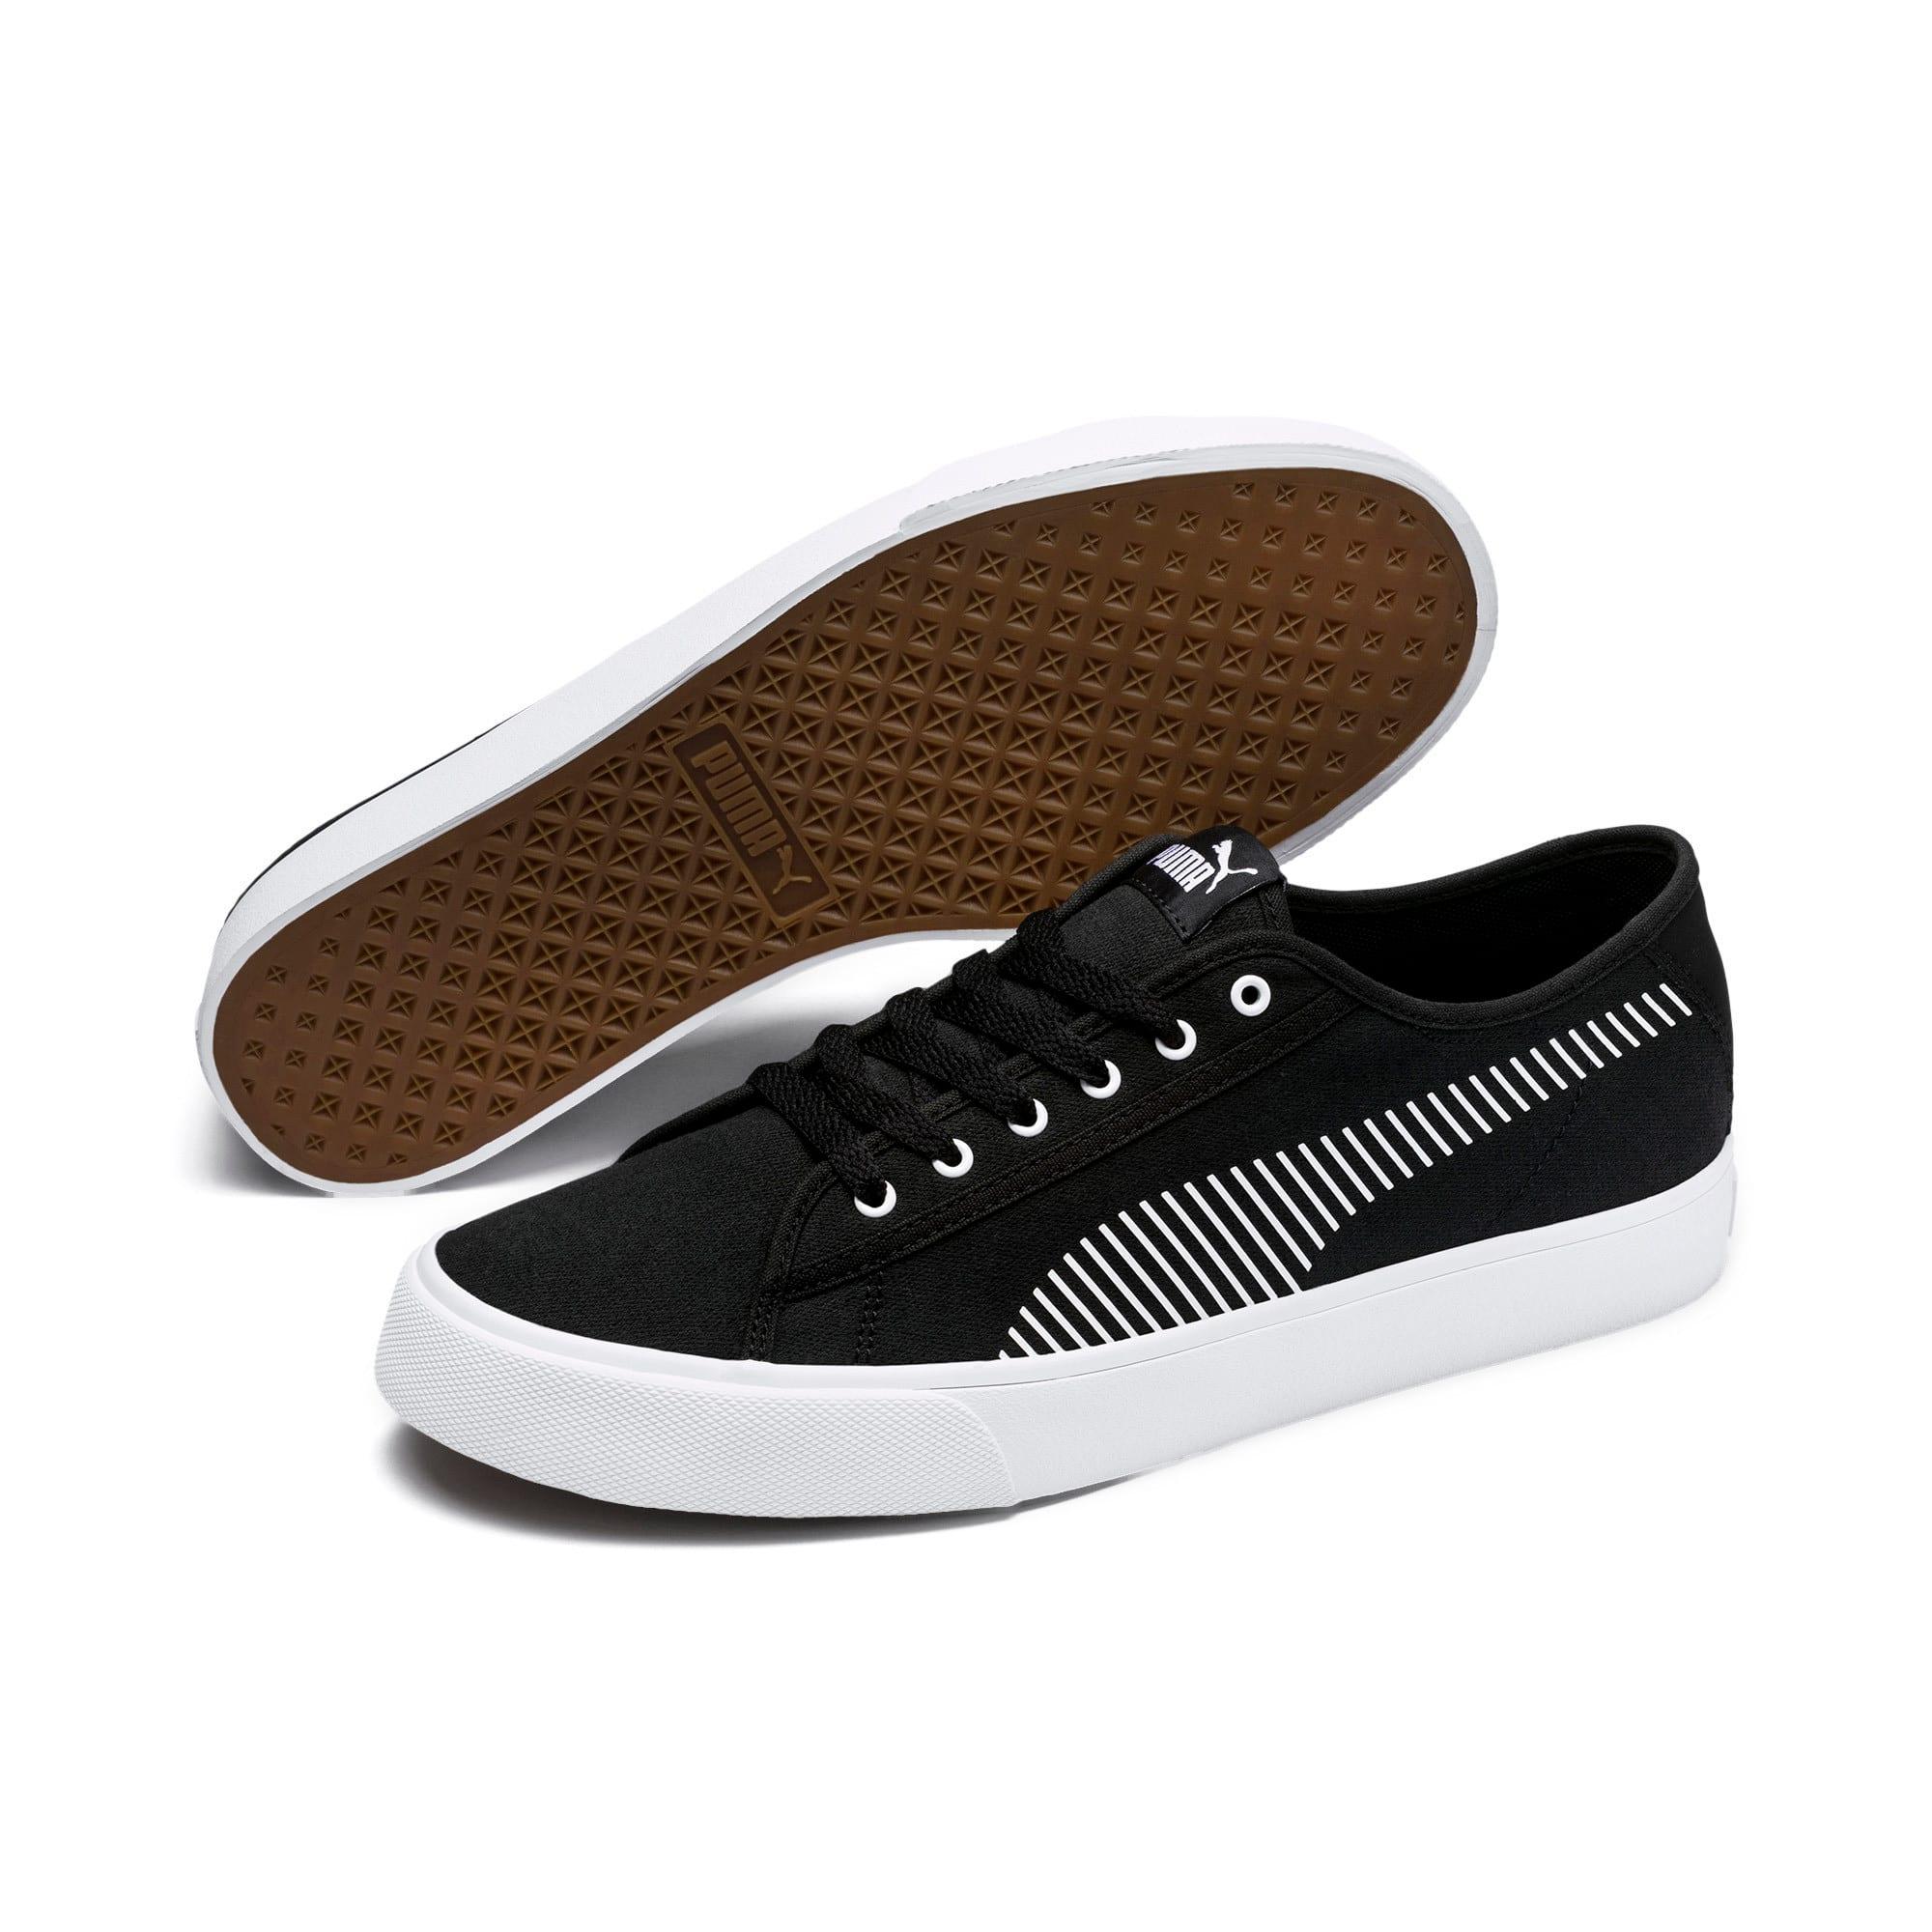 Thumbnail 2 of Bari Sneakers, Charcoal Gray-Puma White, medium-IND